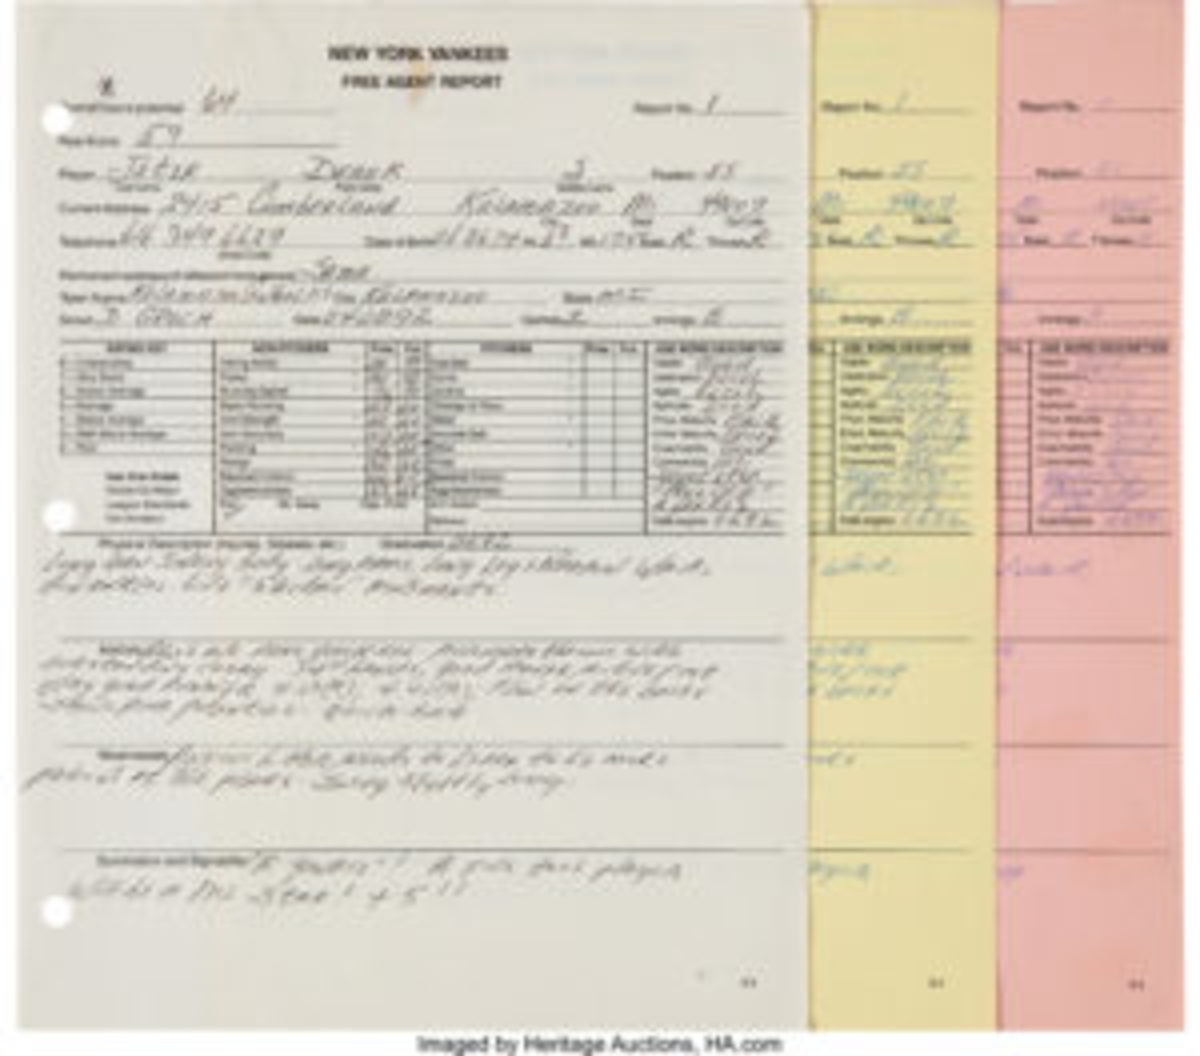 Derek Jeter's 1992 scouting report sold for $102,000.